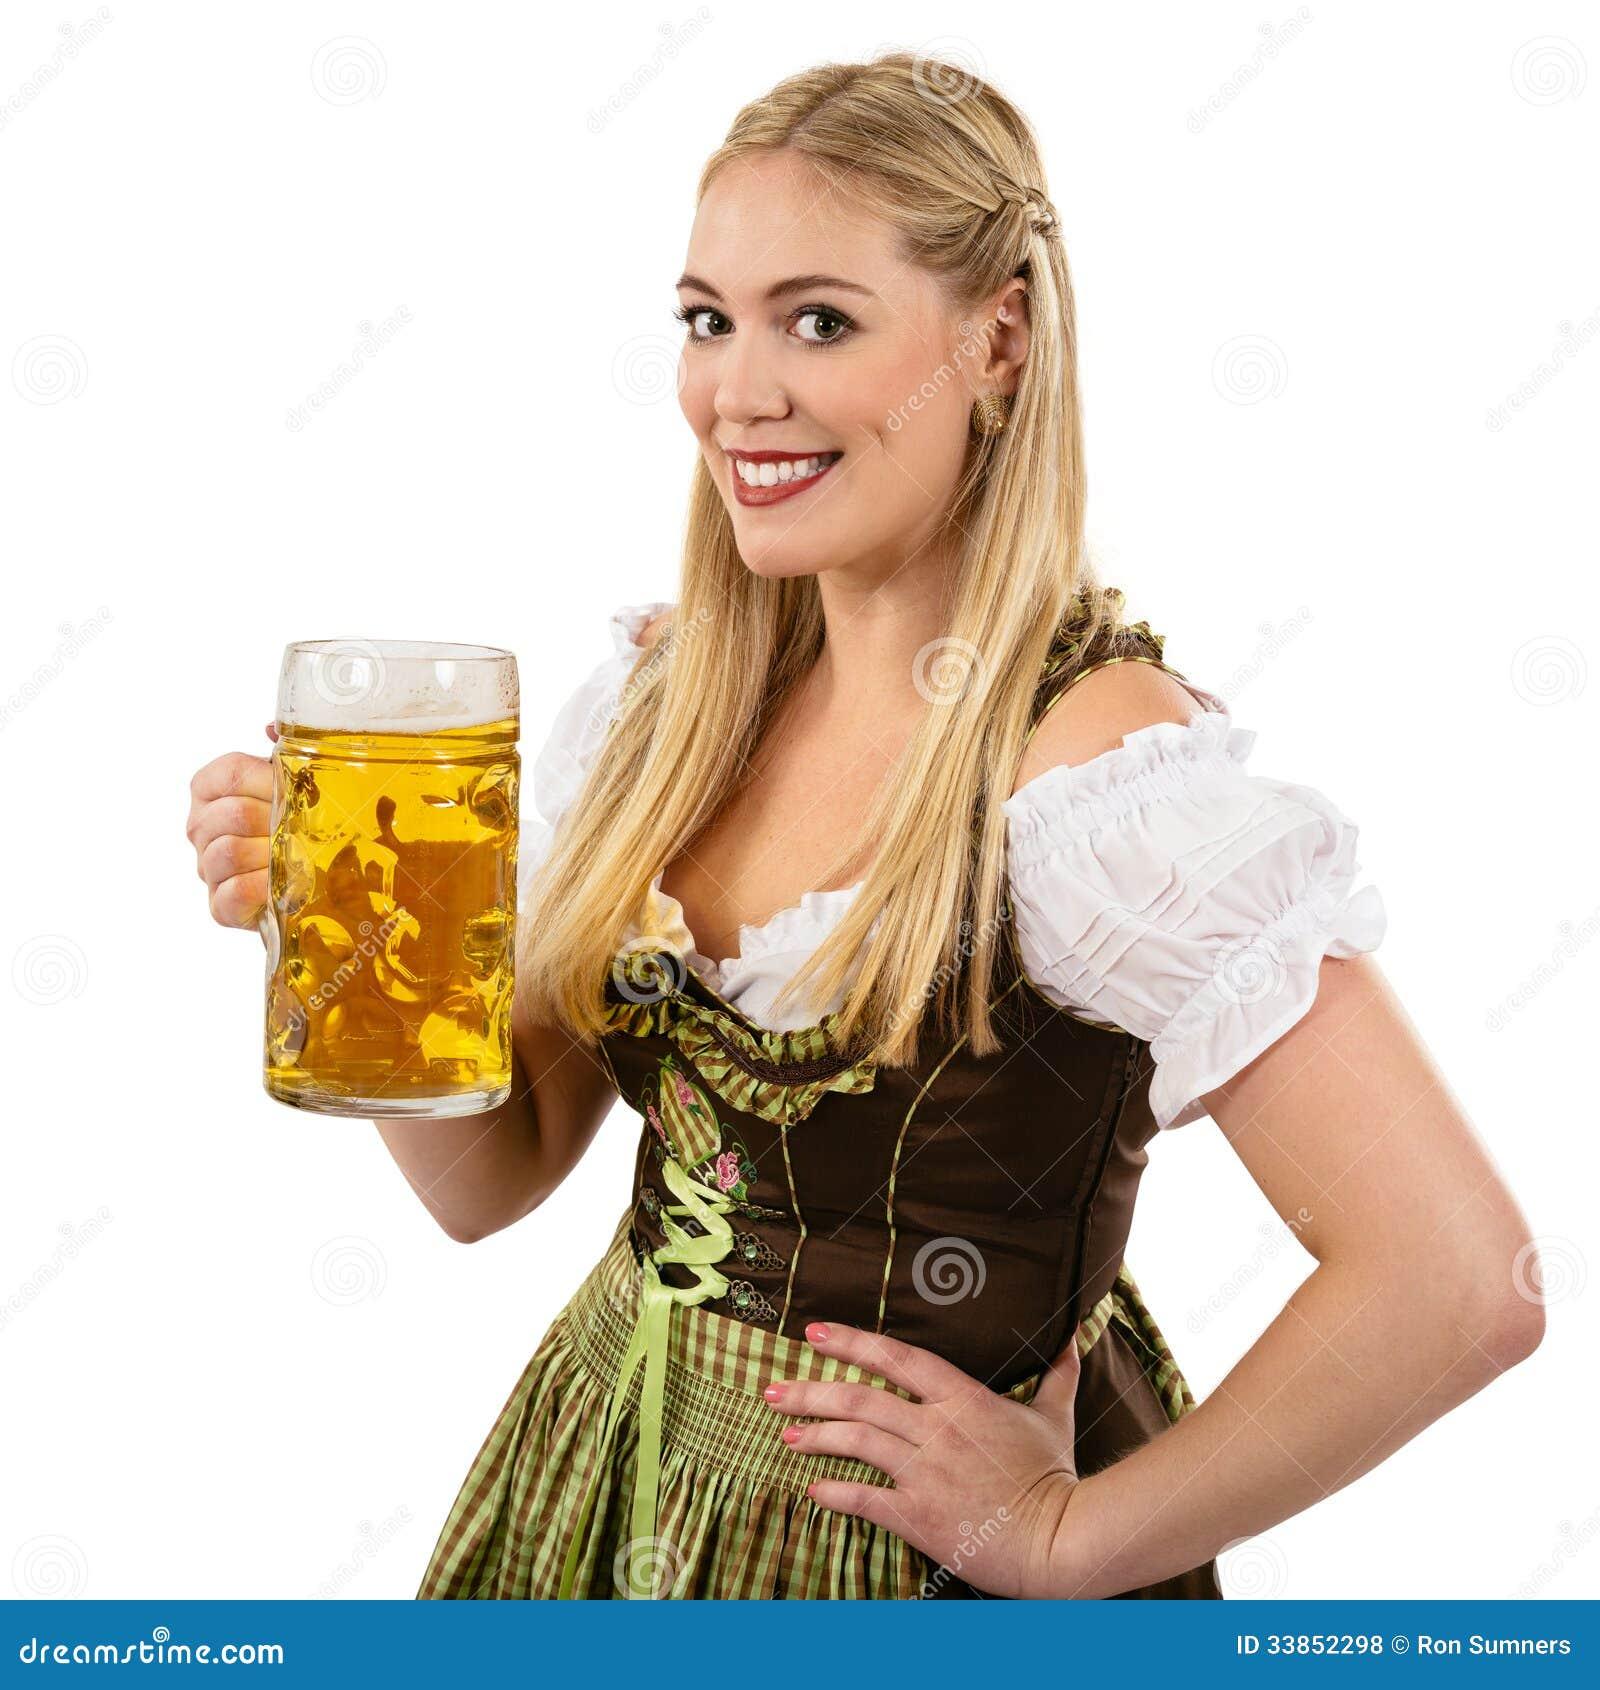 oktoberfest female costume name